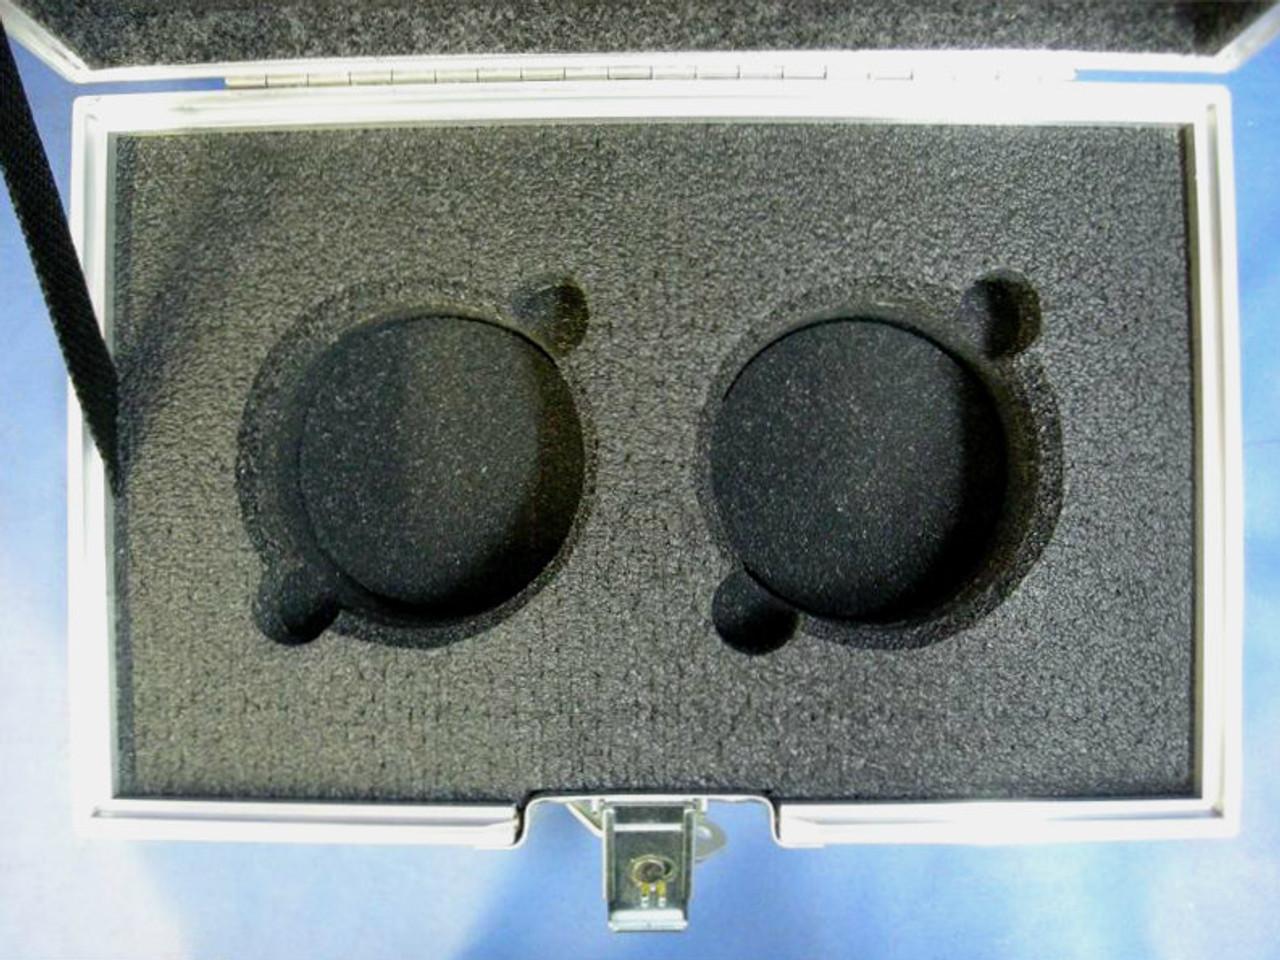 Arriflex Ultra Prime 2 Lens Case